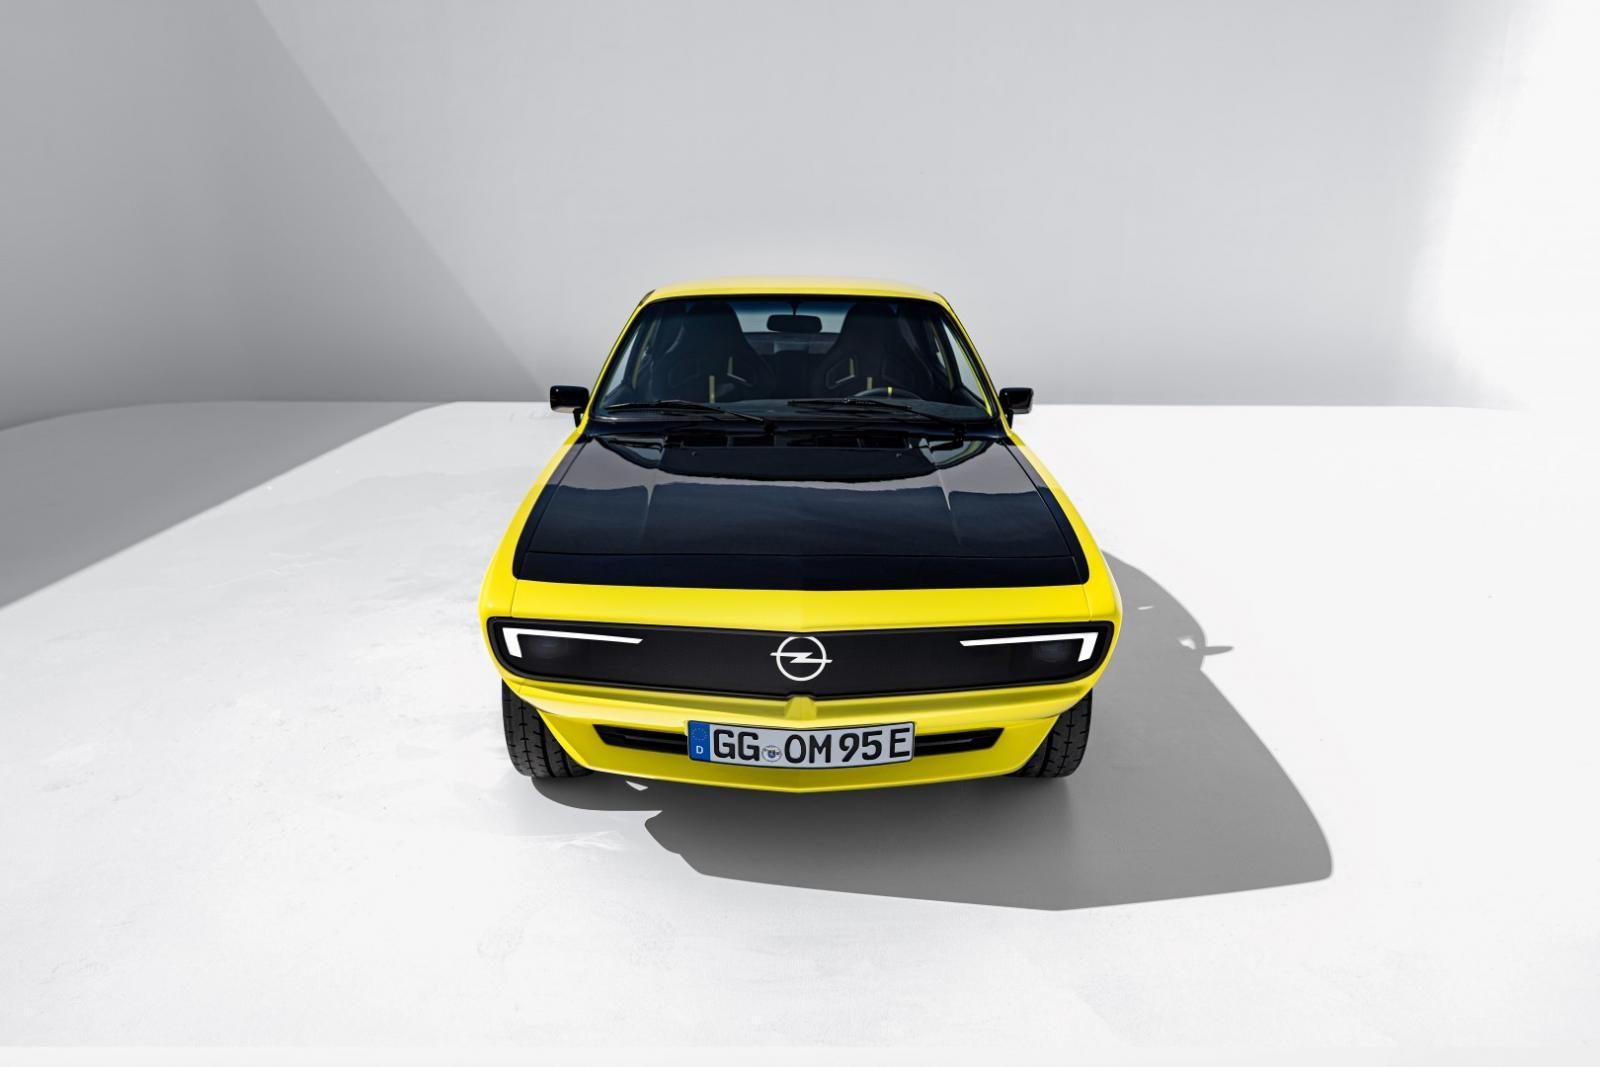 11_Opel-Manta-GSe-ElektroMOD-515566 (Large).jpg